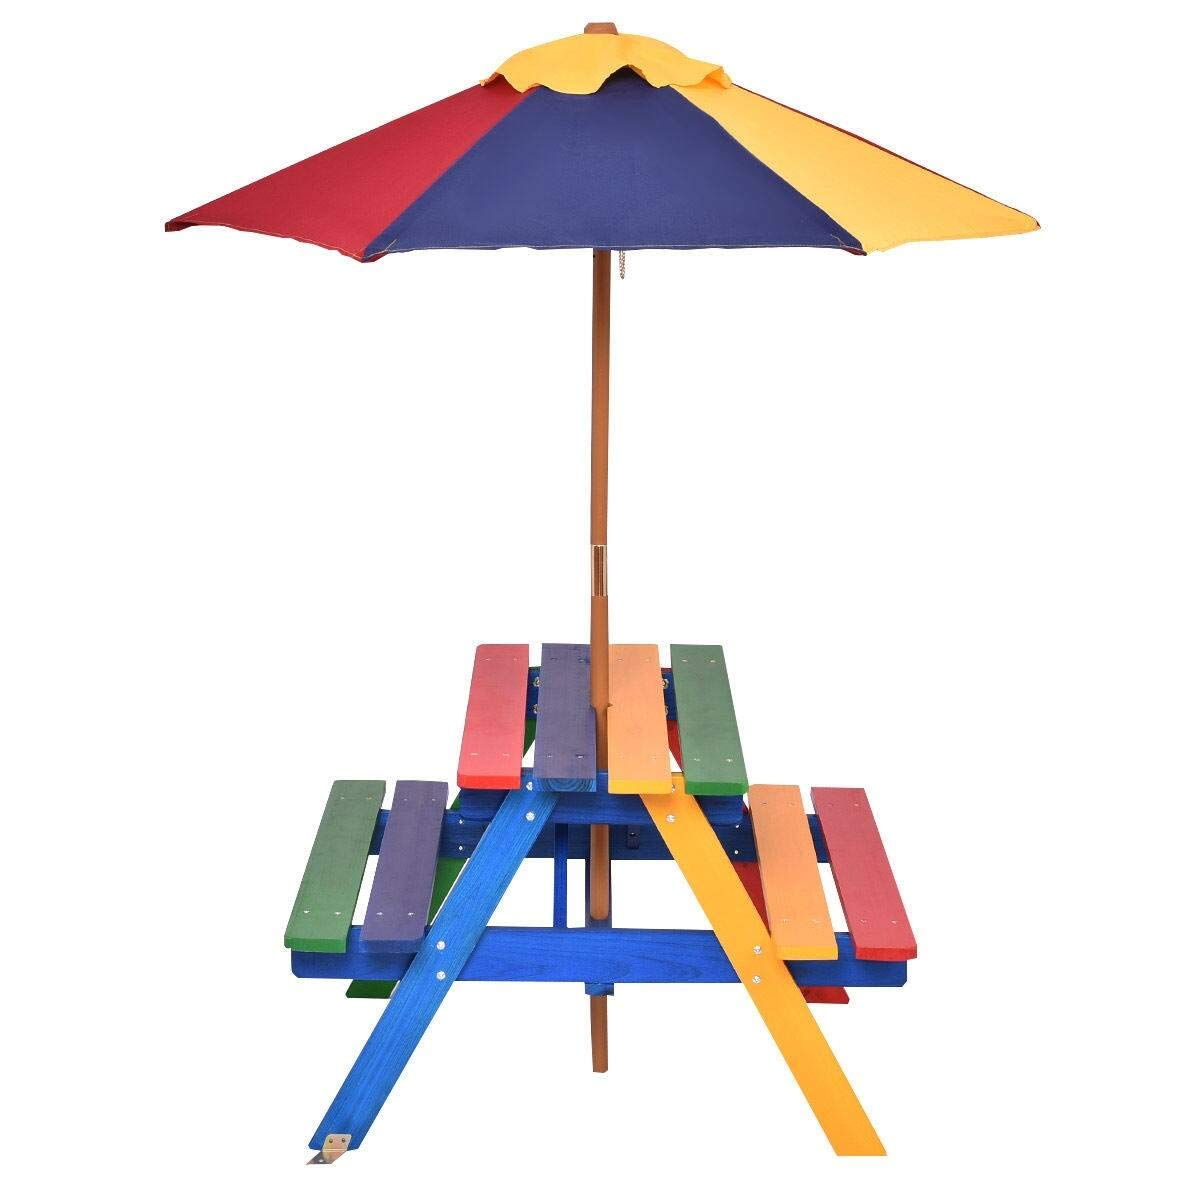 Costway 4 Seat Kids Picnic Table w/Umbrella Garden Yard Folding Children Bench Outdoor by COSTWAY